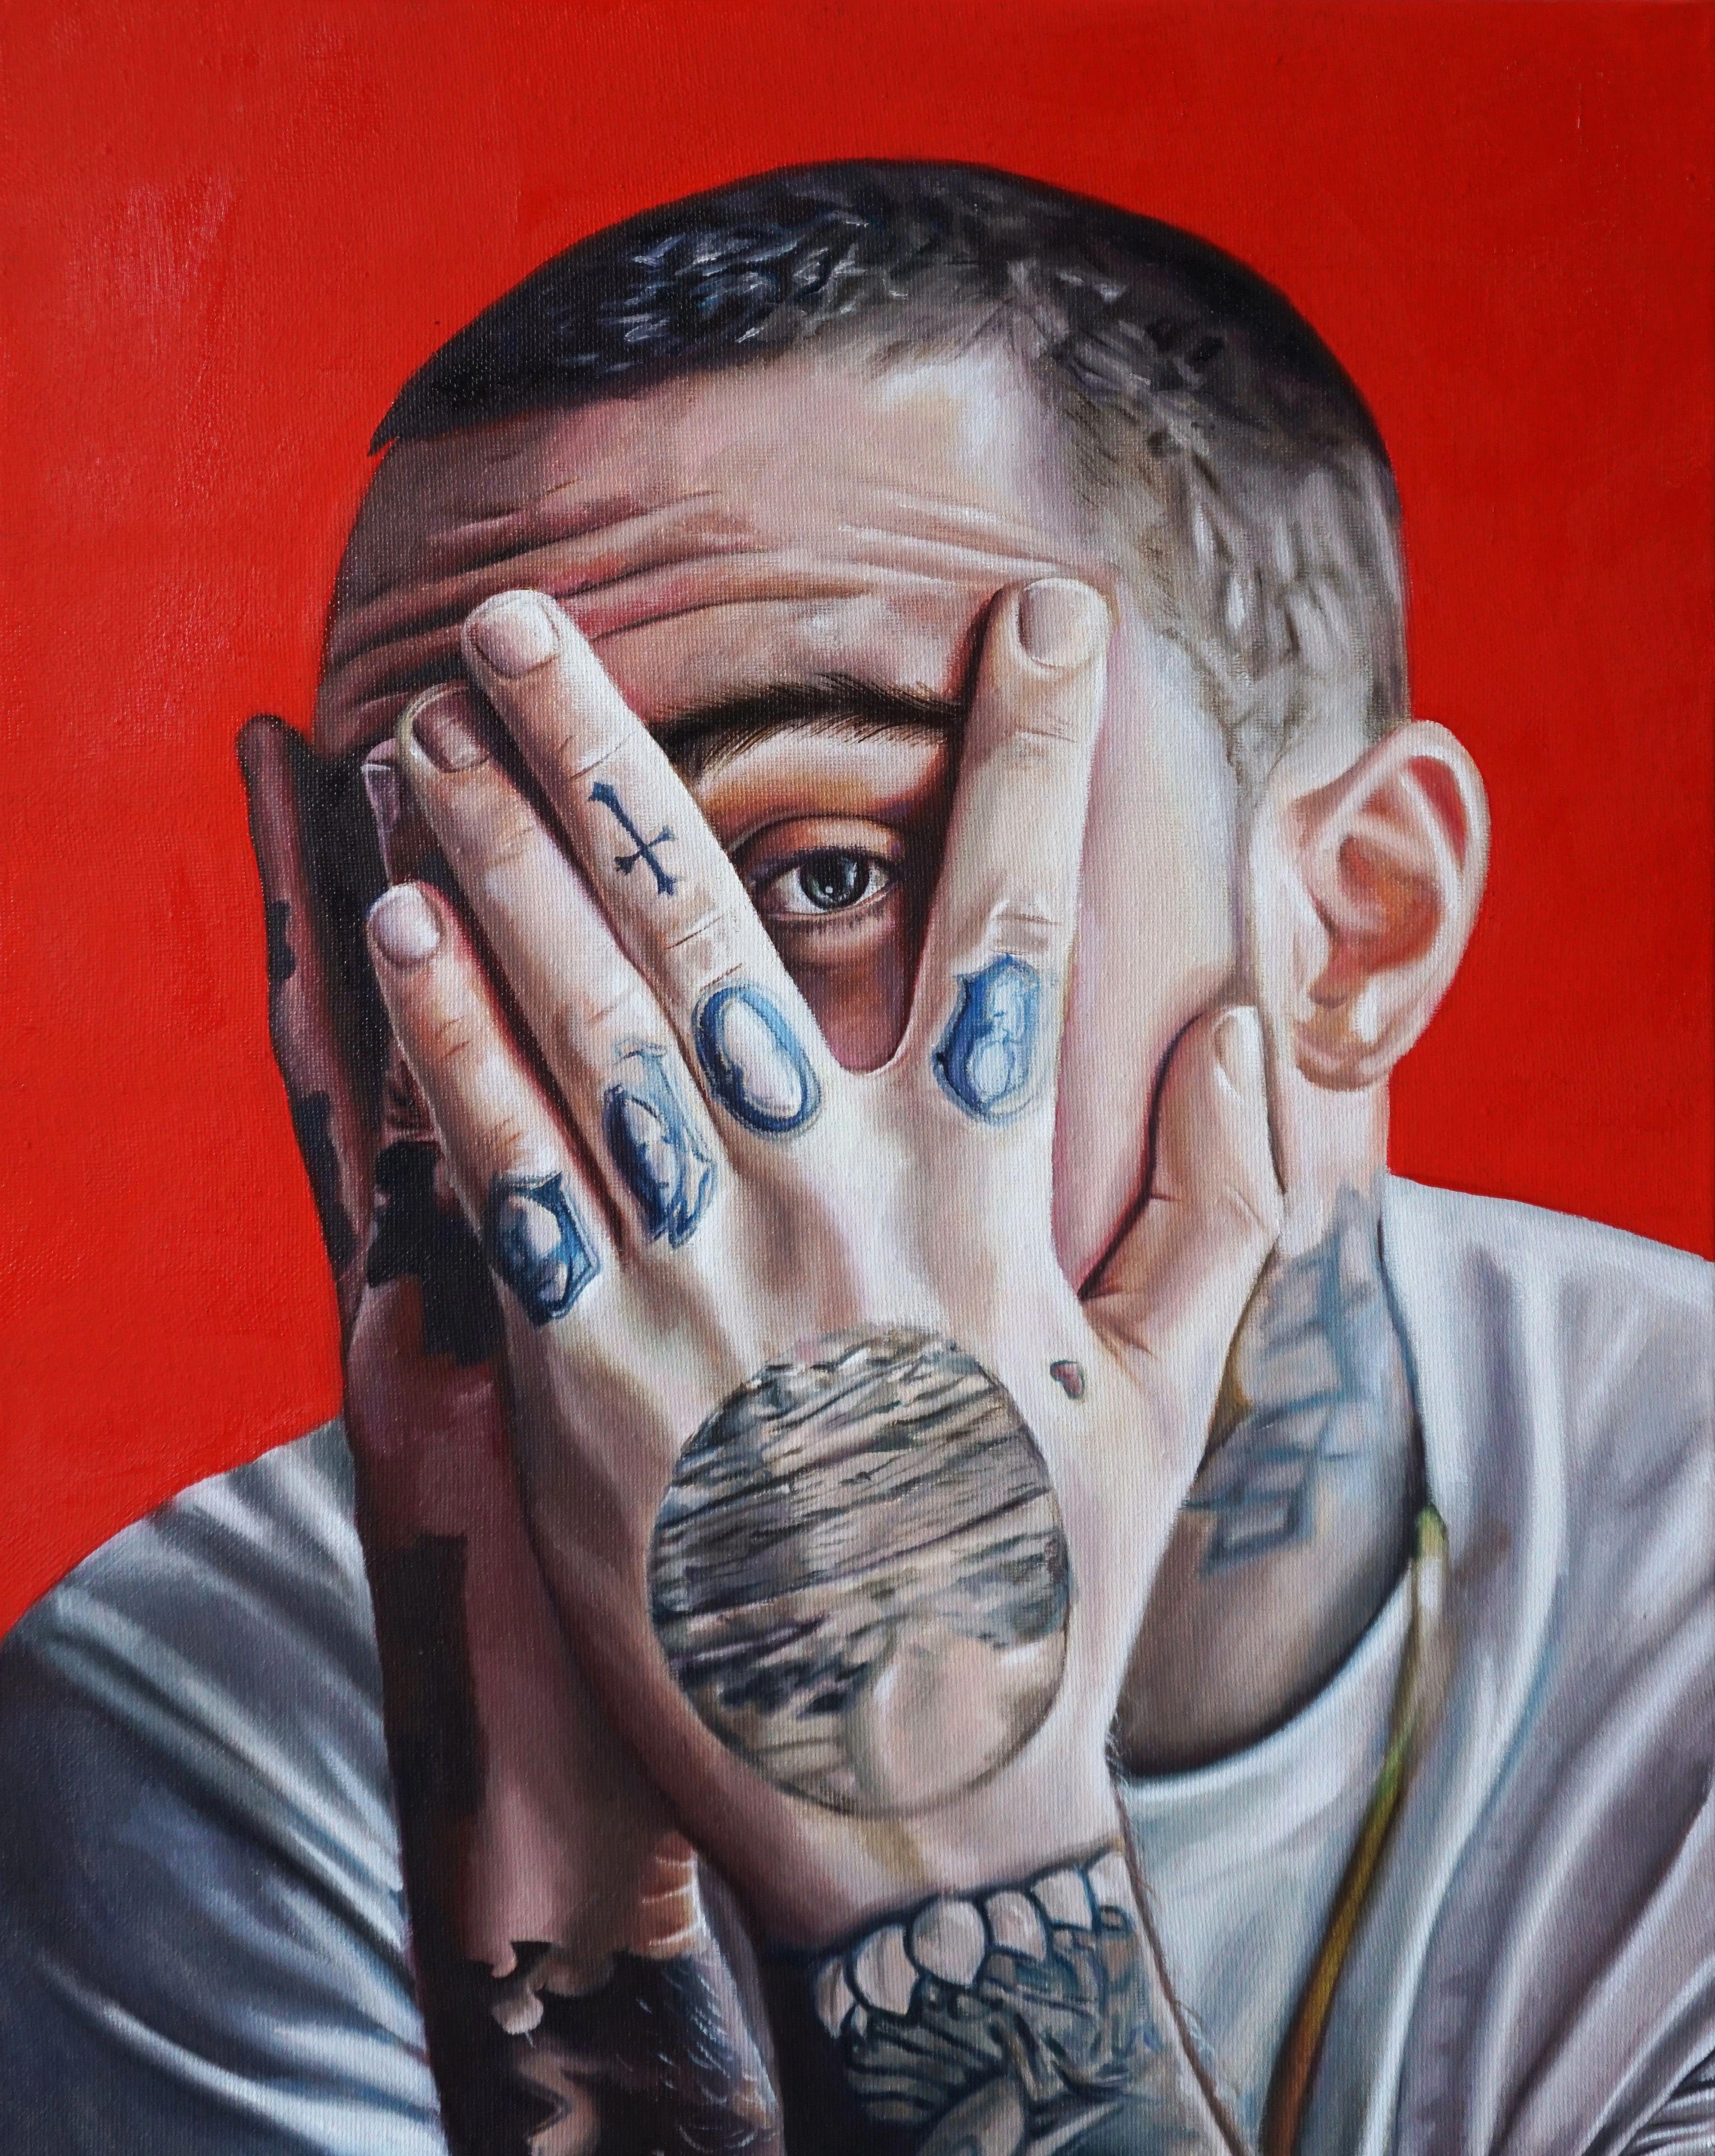 Mac Miller Tribute Tattoo: Mac Miller Oil Painting On Canvas IG @zainaxm